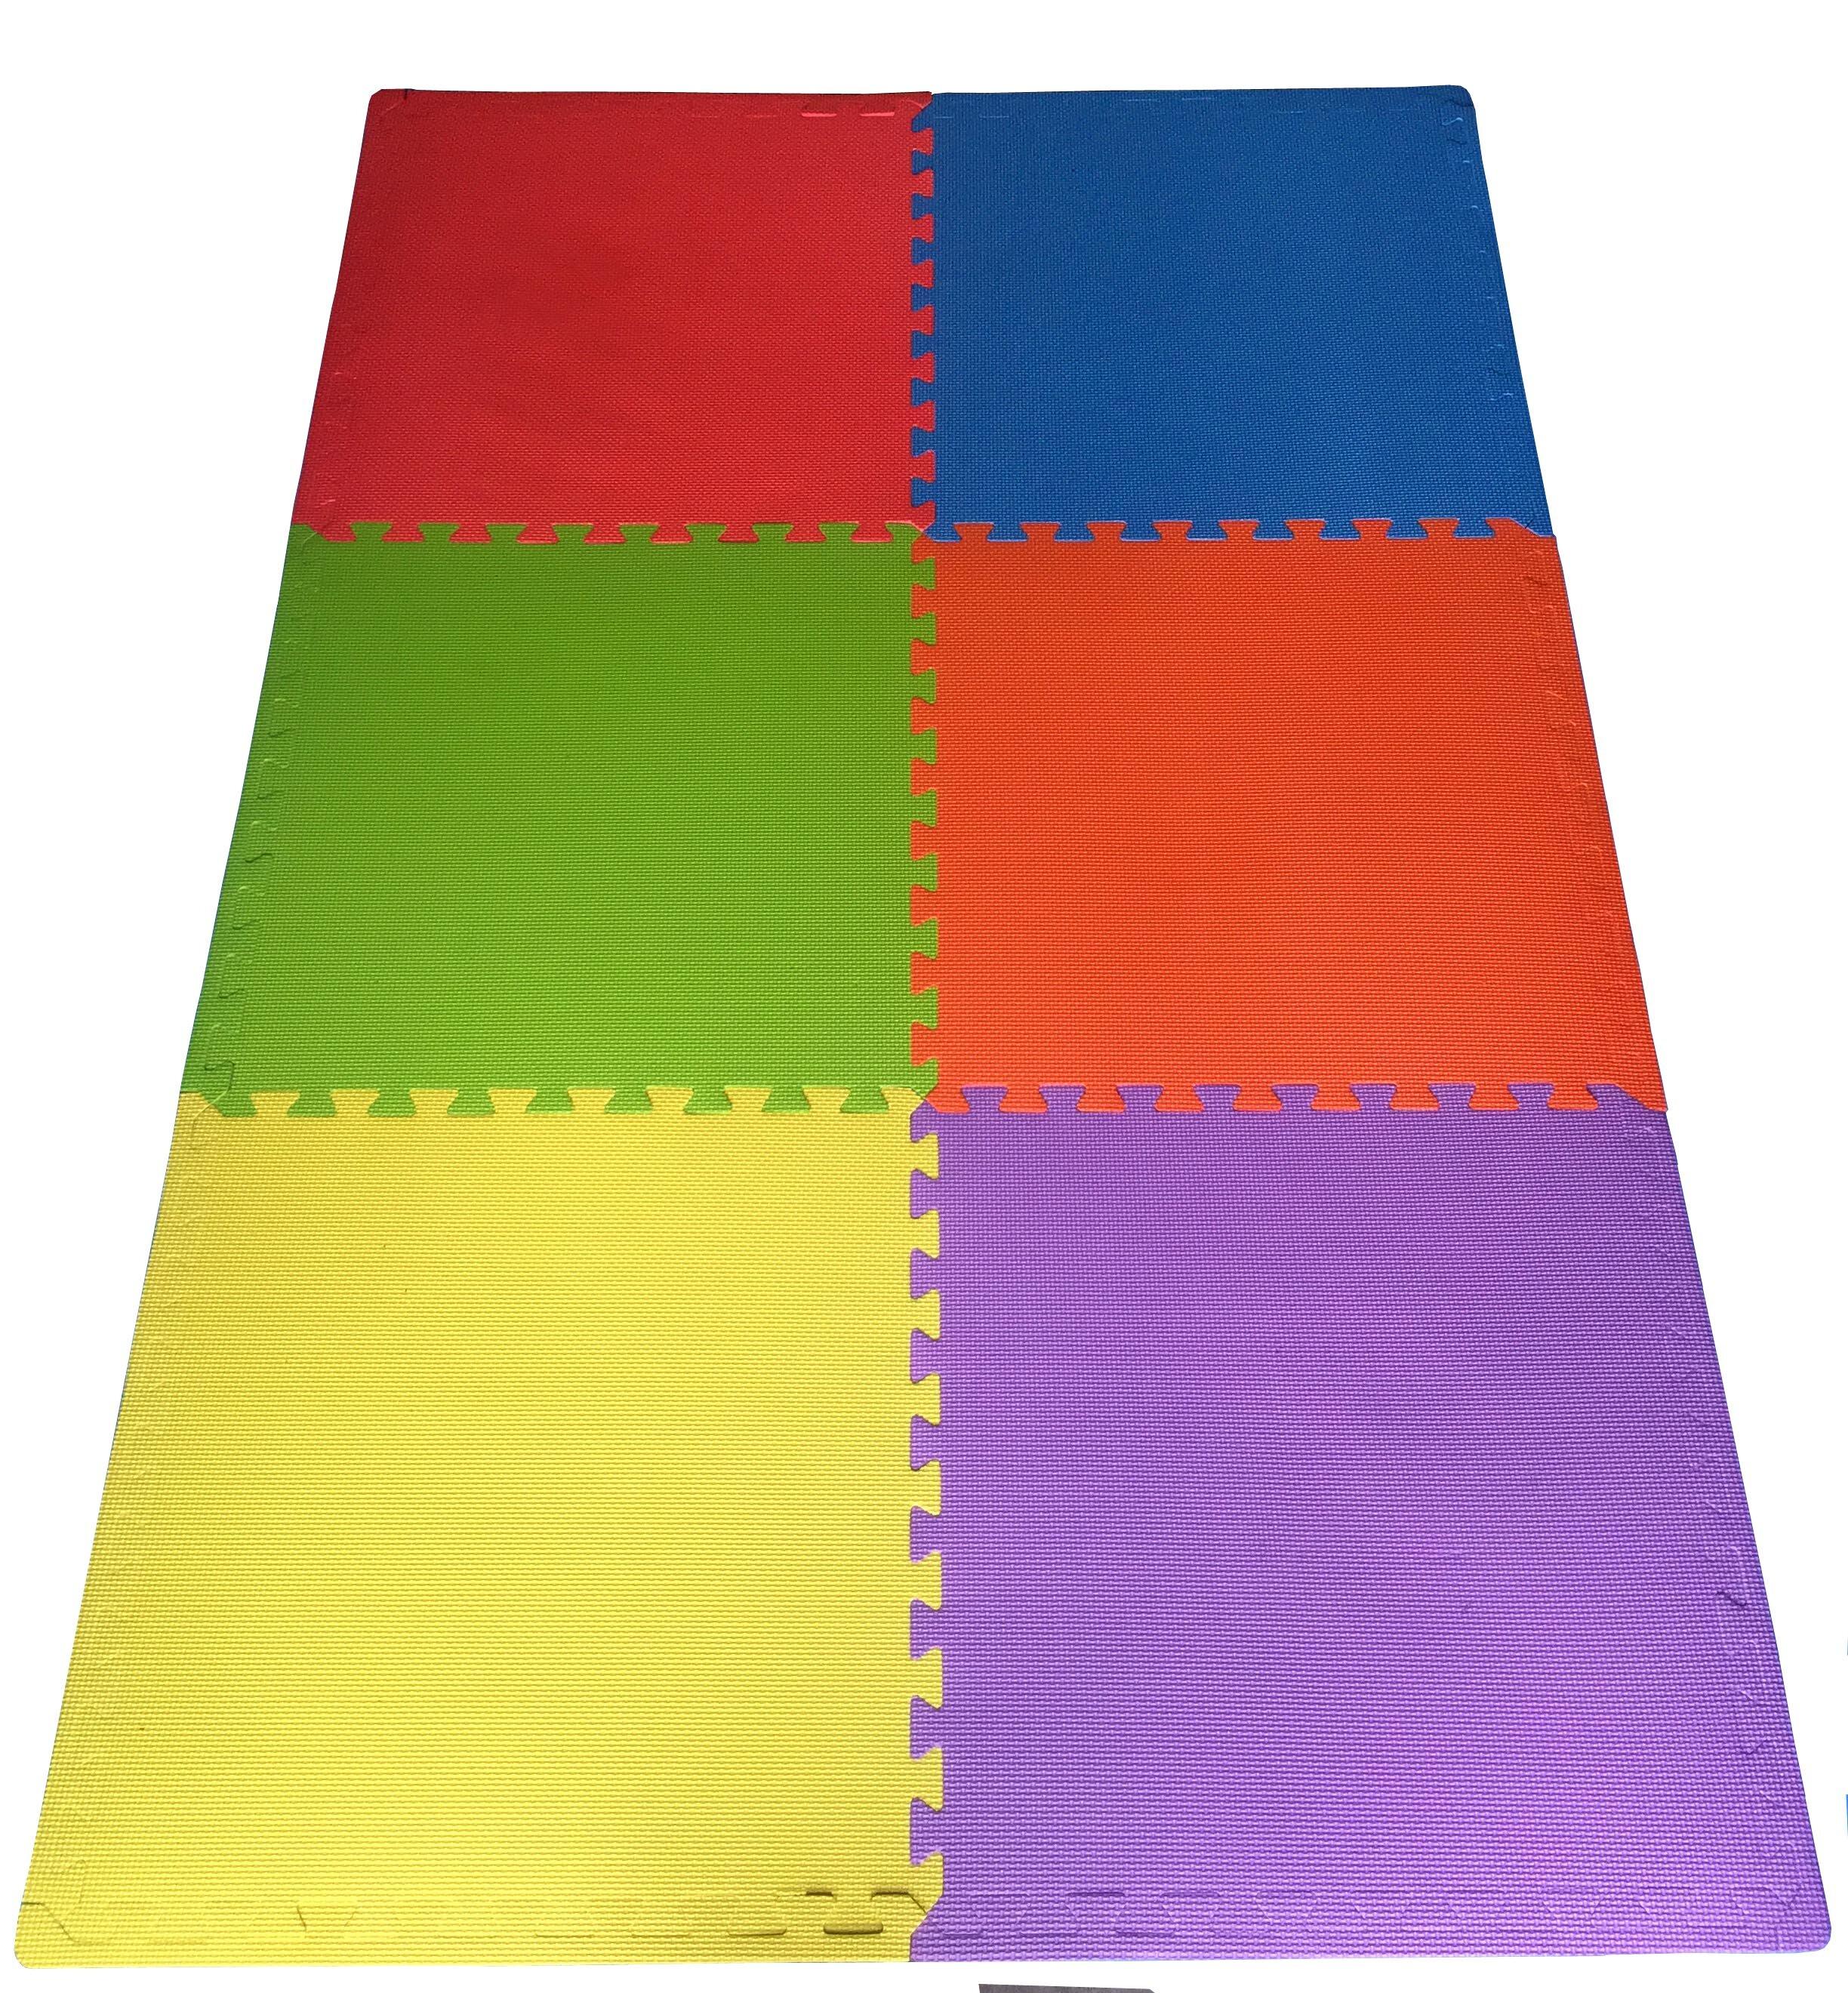 babys toys main p online ara baby in puzzle s buy mat eva uae carrefour mafuae other mats eng en